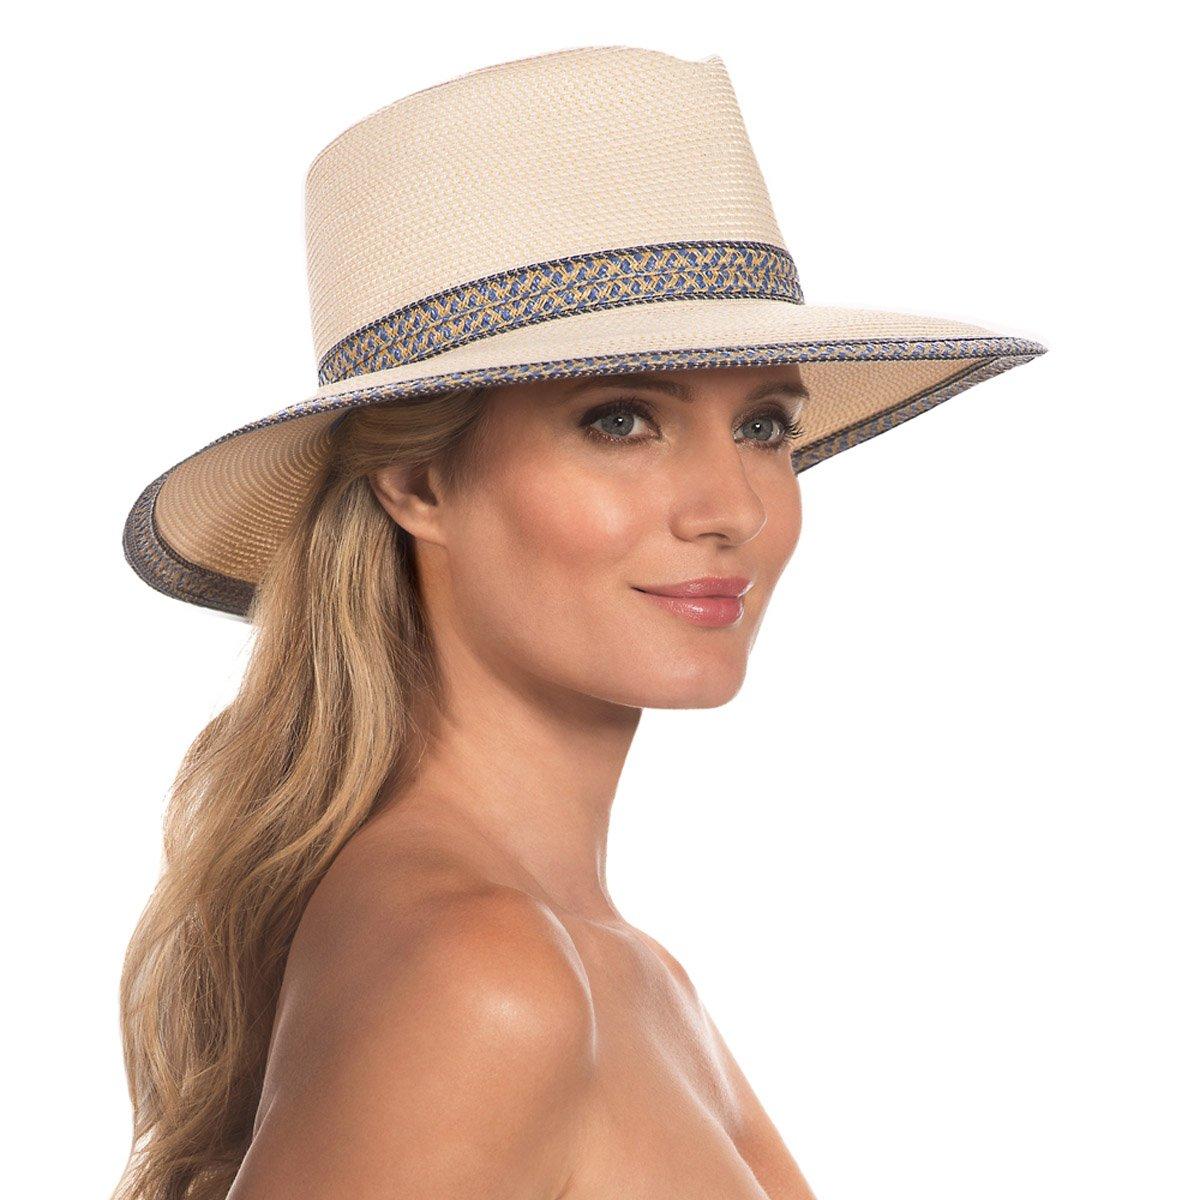 Eric Javits Luxury Fashion Designer Women's Headwear Hat - Georgia - Cream/Blue Tweed